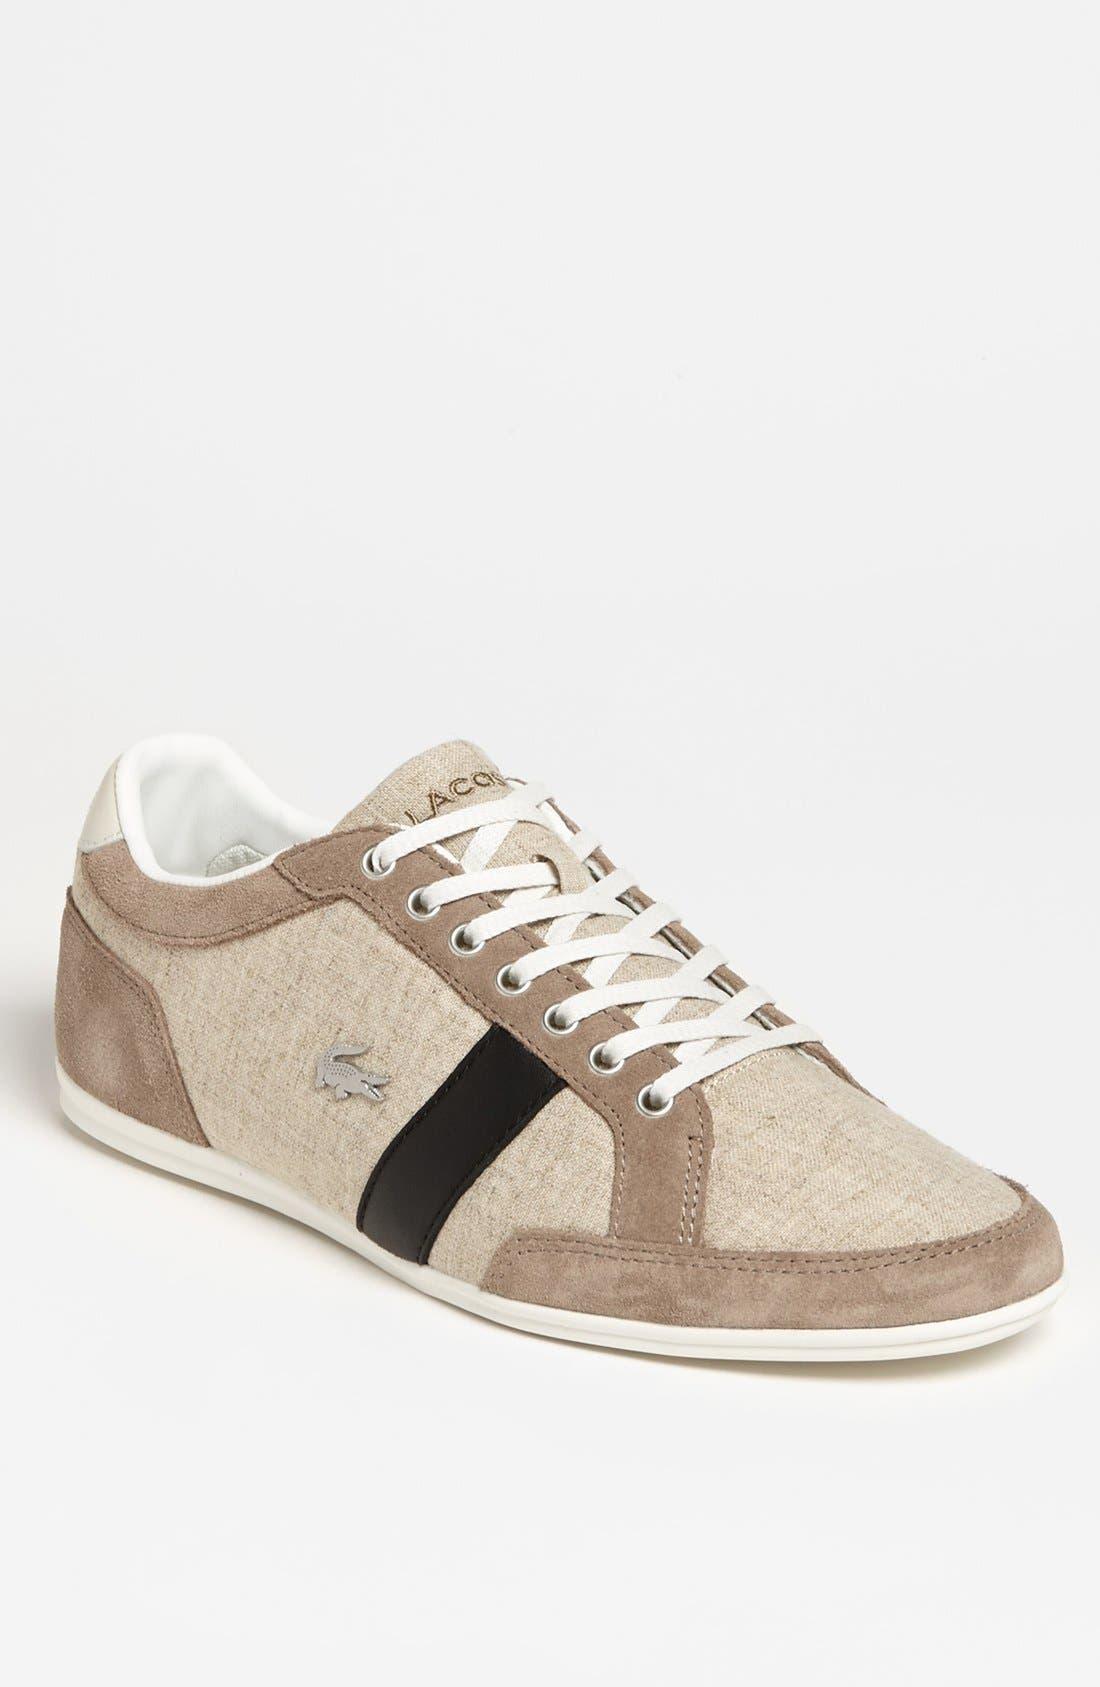 Alternate Image 1 Selected - Lacoste 'Alisos 12' Sneaker (Men)